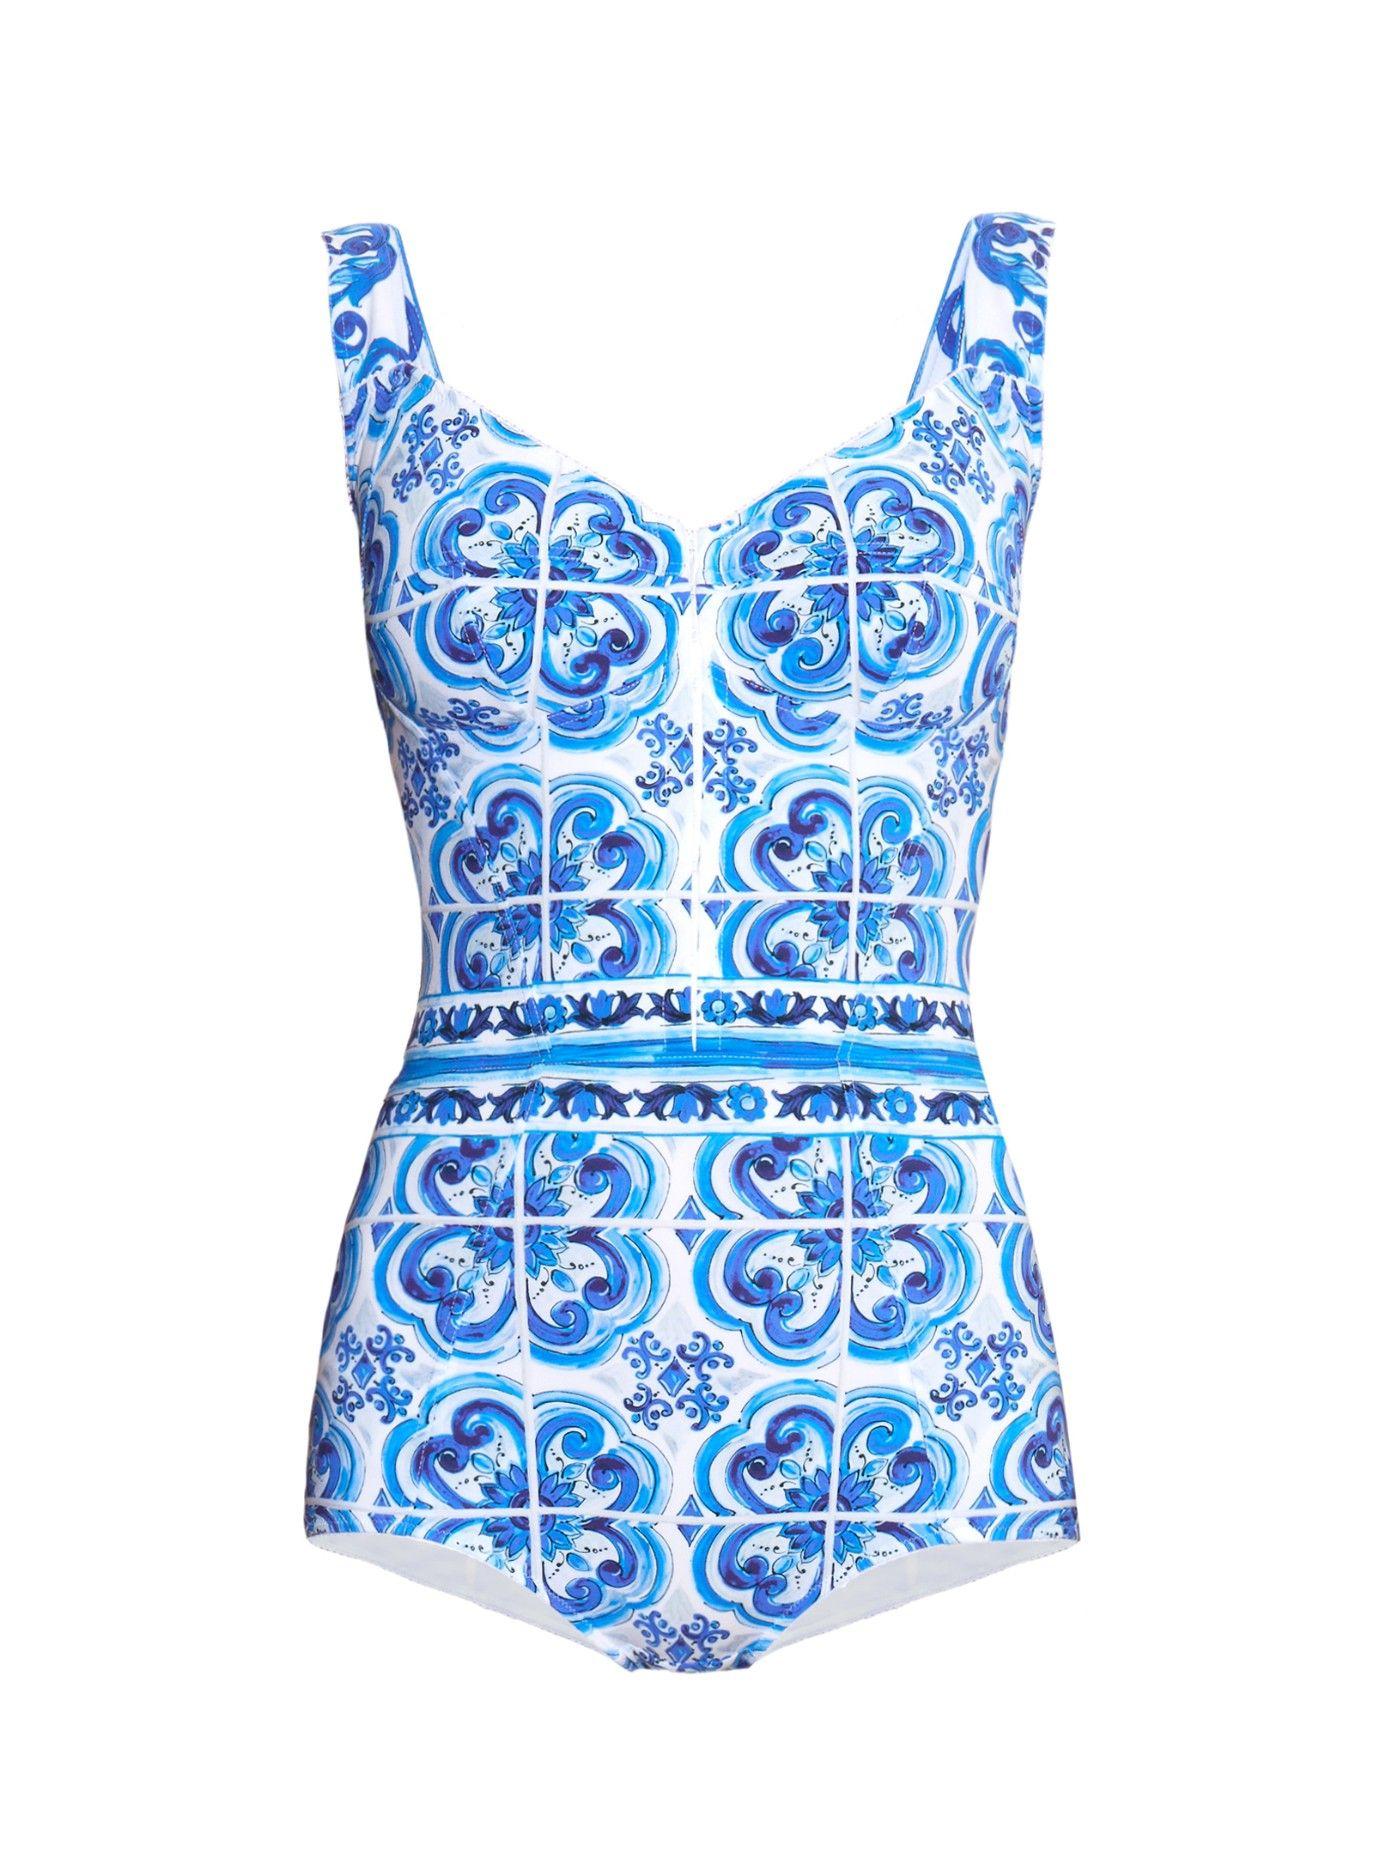 c26cabdf661 Majolica-print swimsuit | Dolce & Gabbana | MATCHESFASHION.COM UK 1  Piece